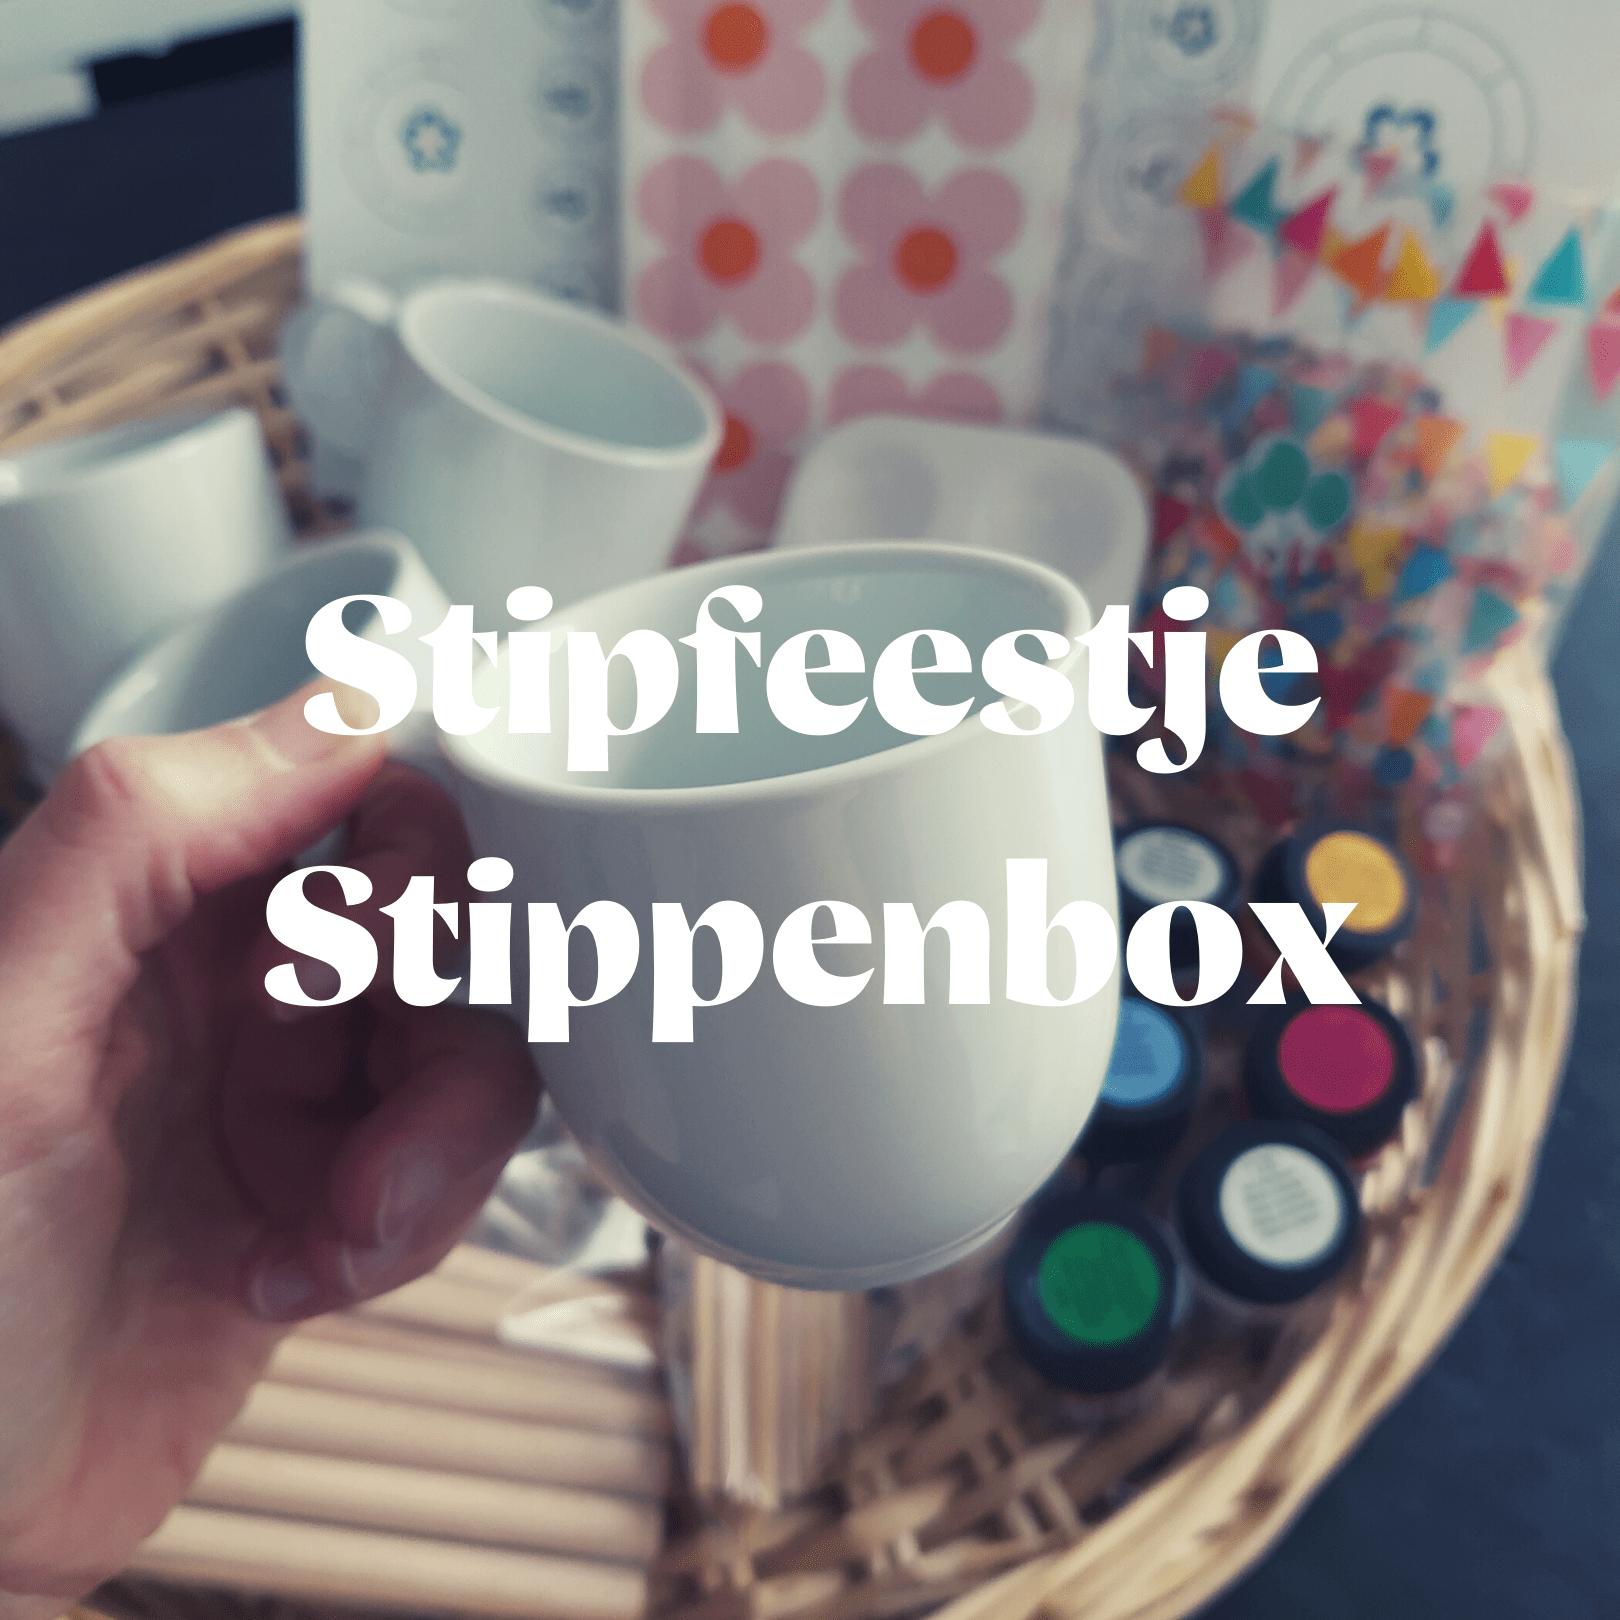 stipfeestje-stippenbox